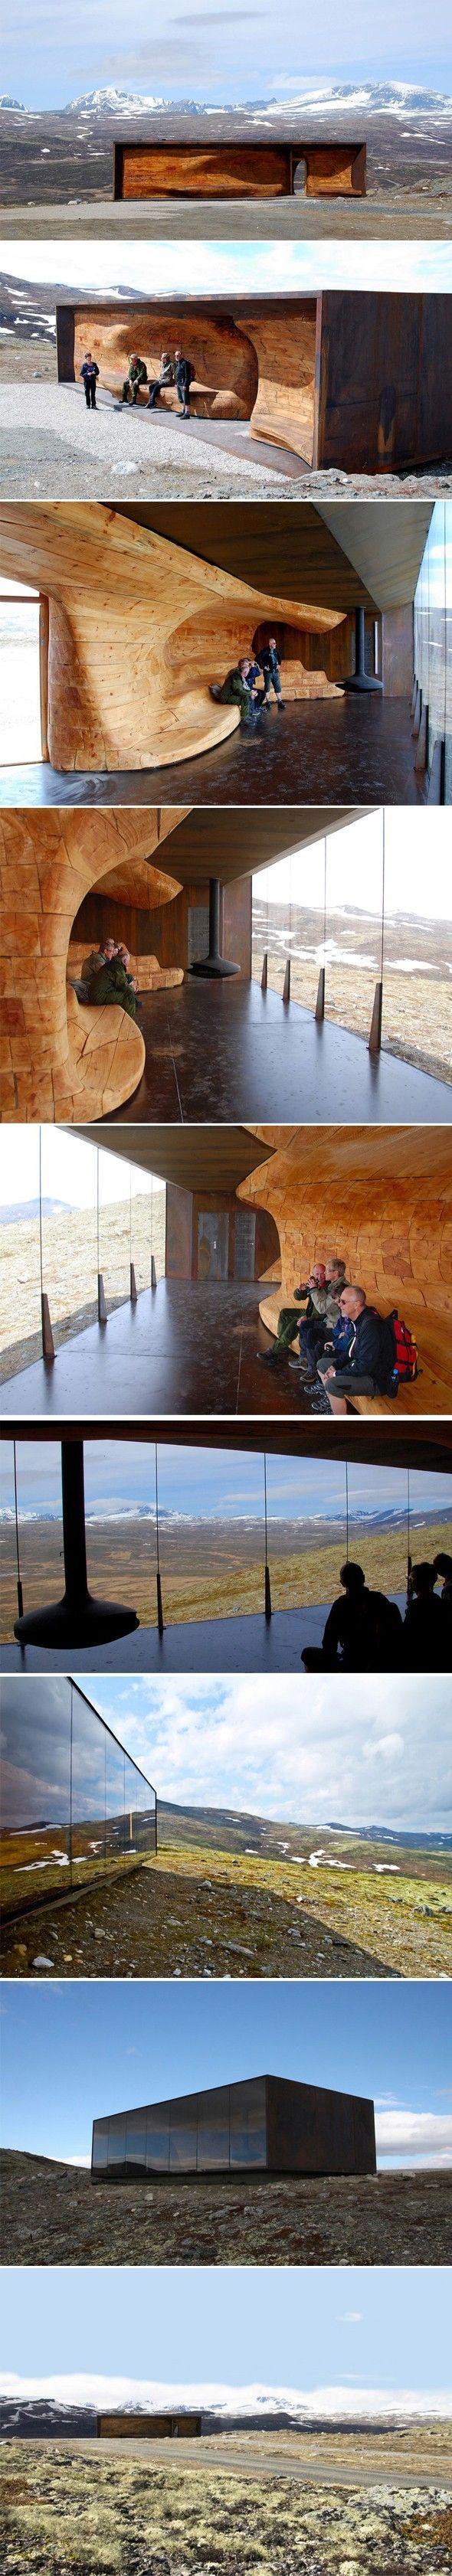 Norwegian Wild Reindeer Centre Pavilion par Snohetta - Journal du Design